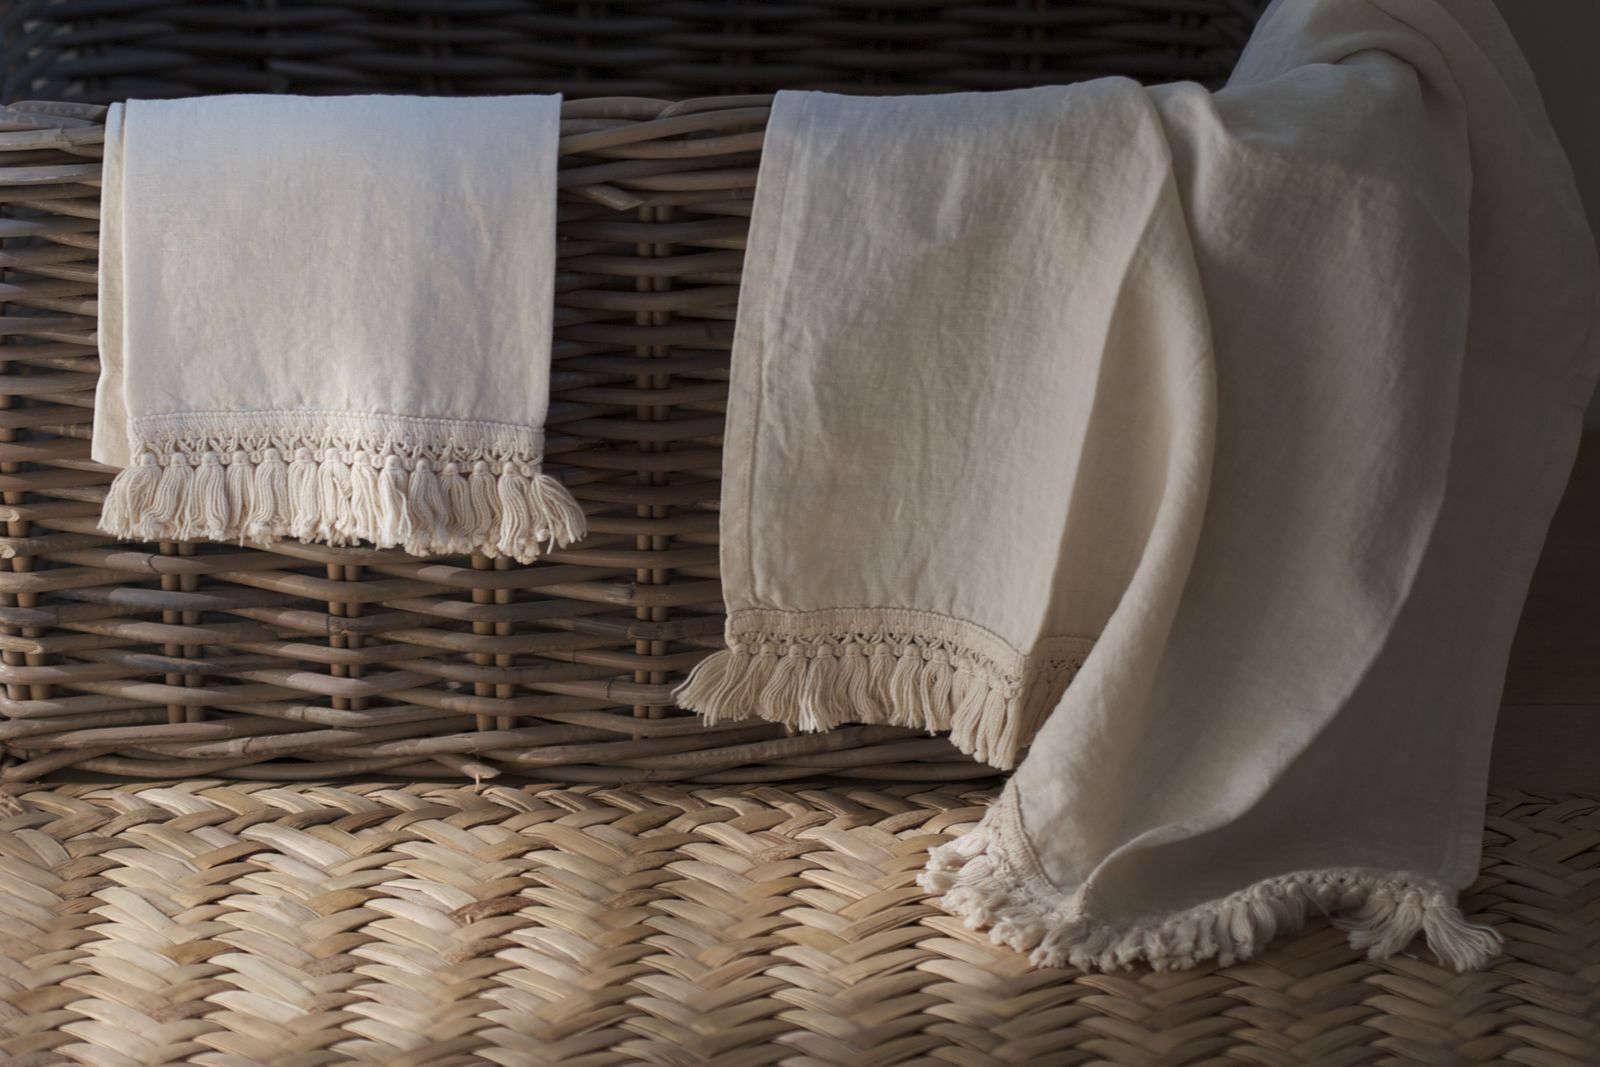 fringed towel set once milano 10